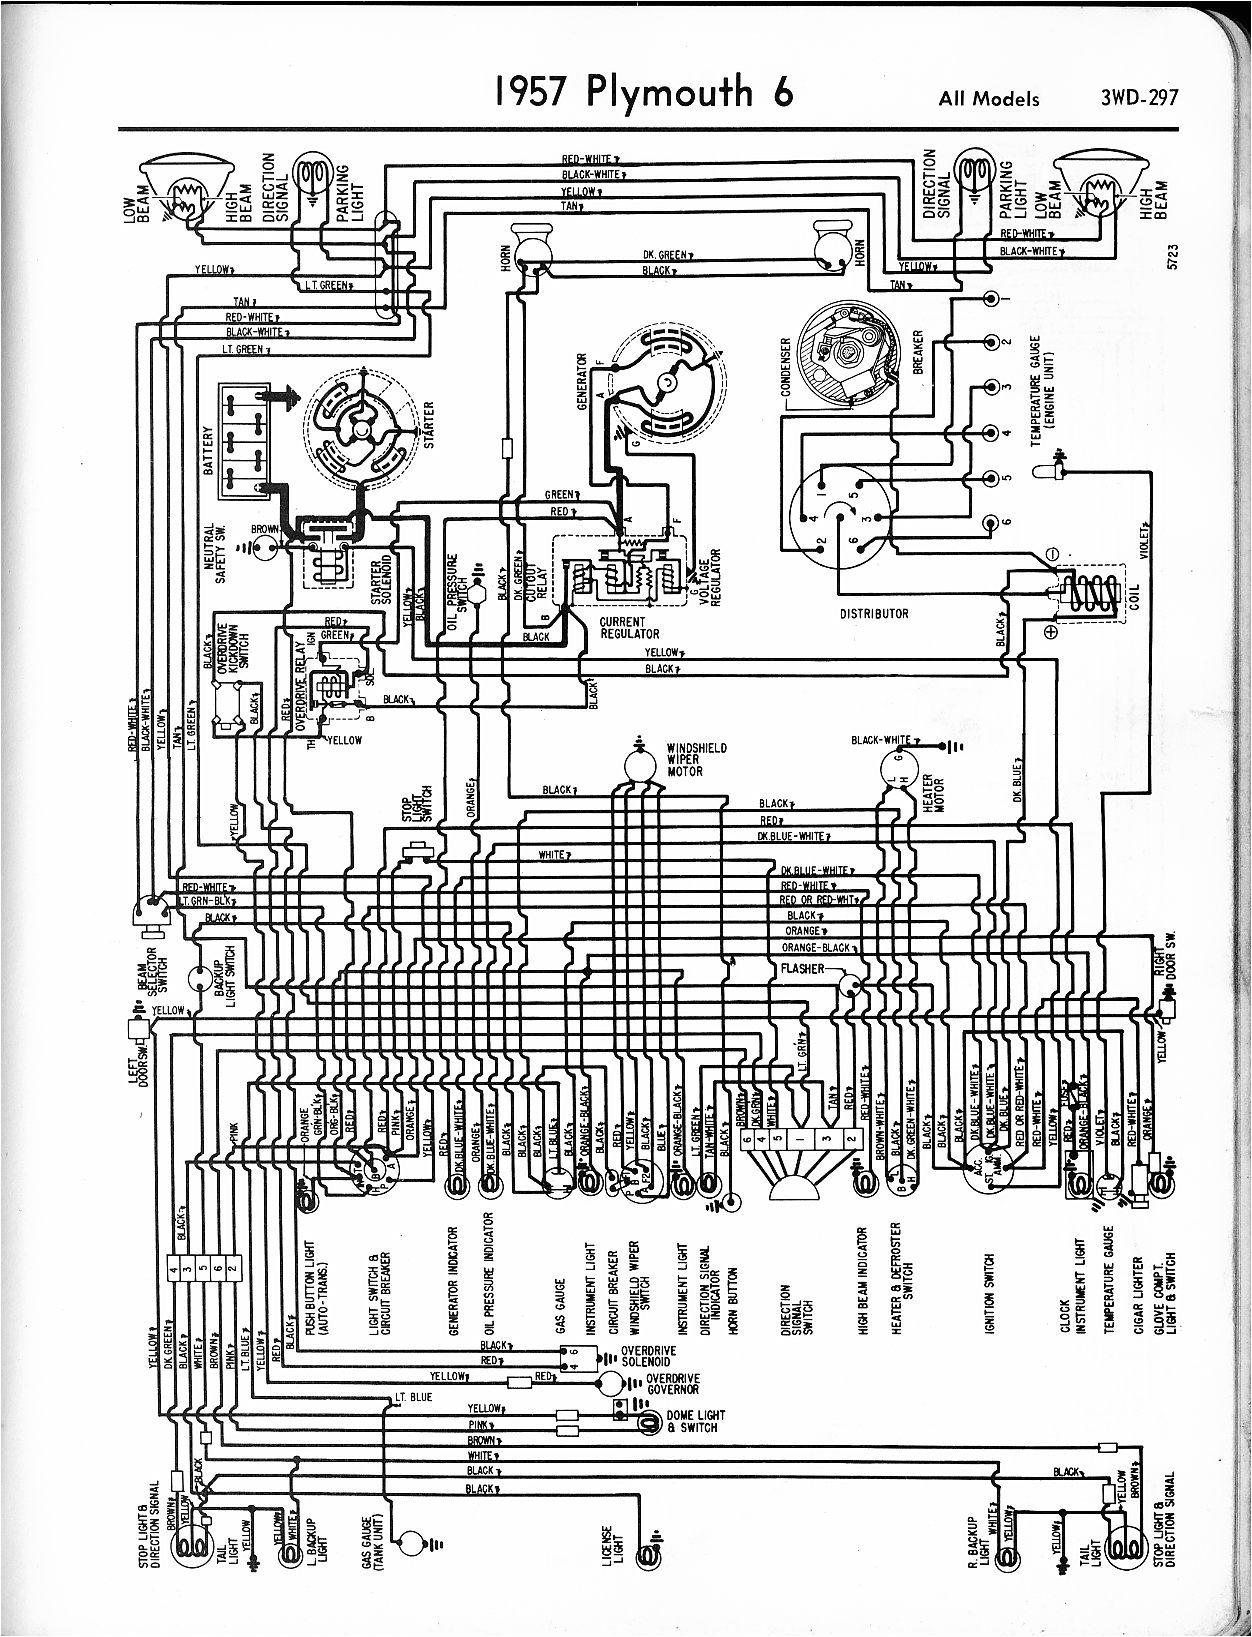 powerflite wiring diagram electrical schematic wiring diagram powerflite wiring diagram